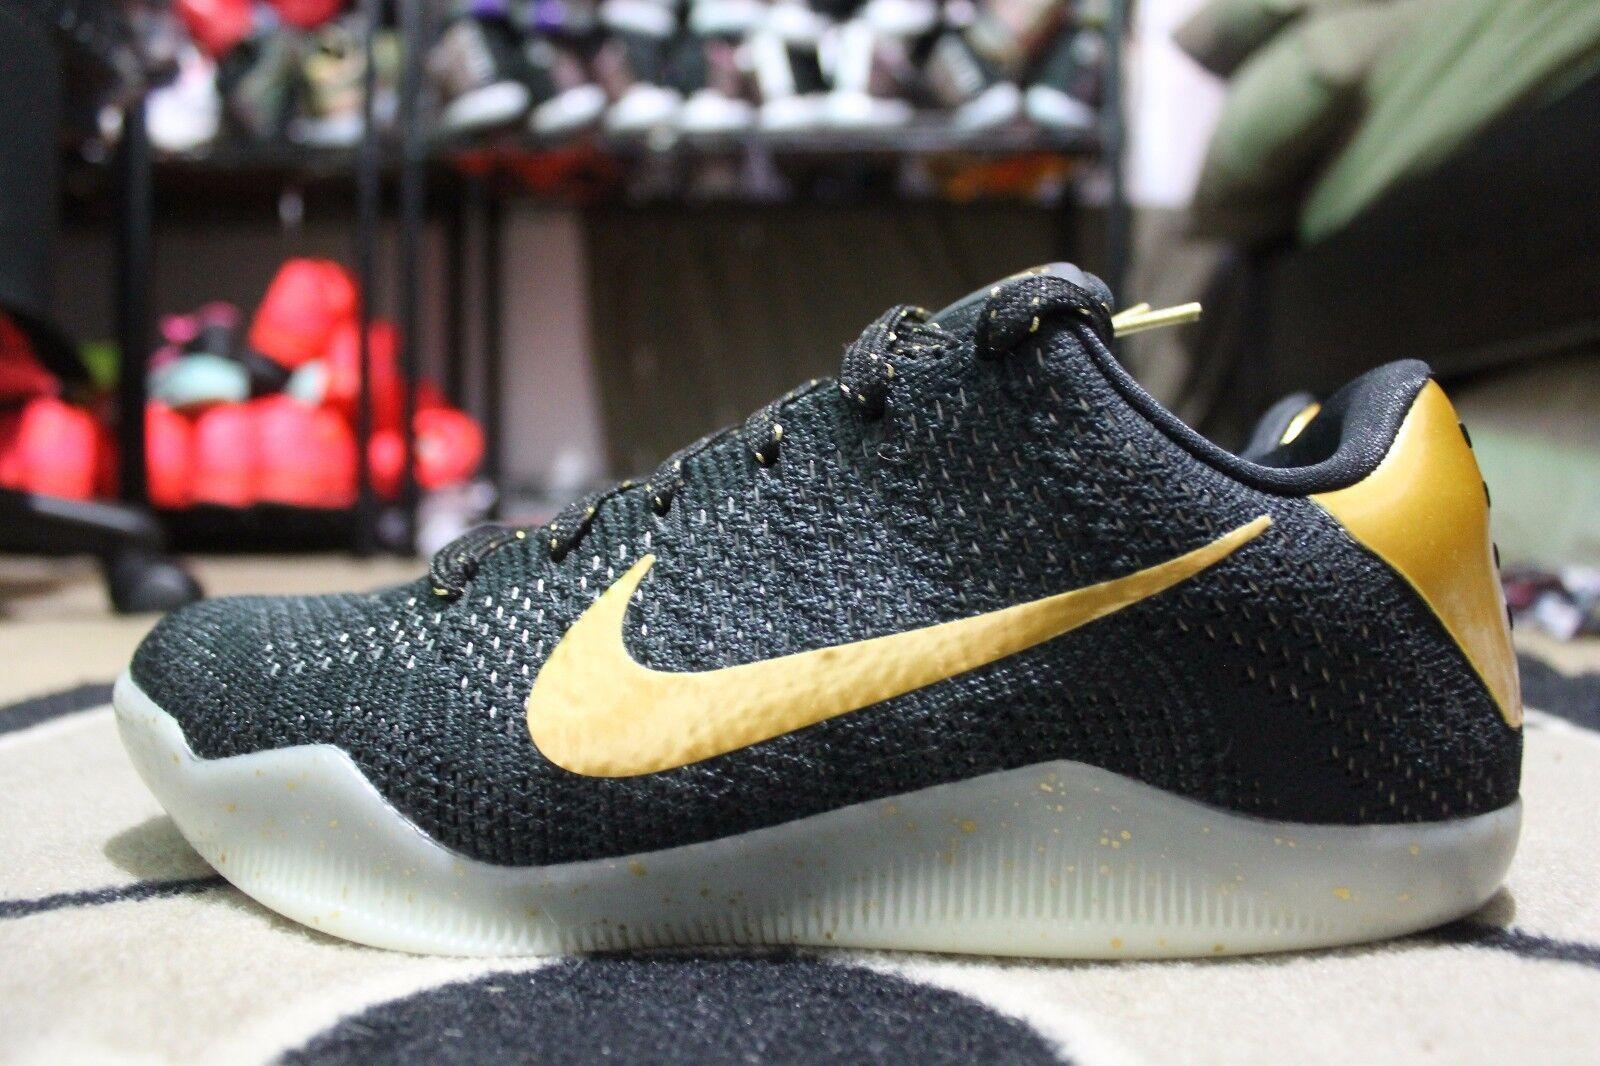 NEW Nike Kobe XI Elite Low Flyknit iD Triple Black Sz 8 Glow in the Dark